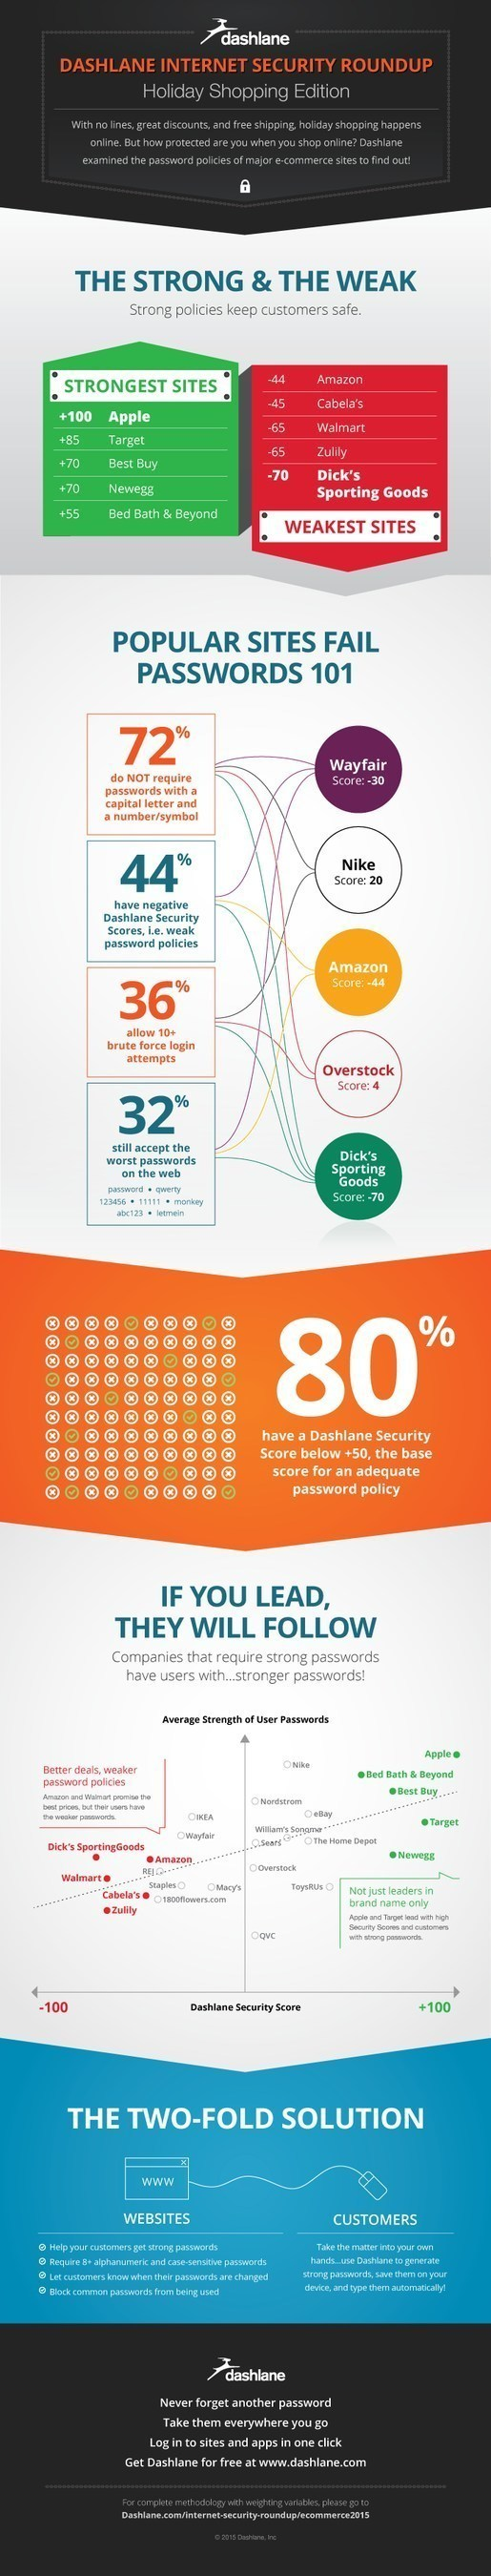 Dashlane ECommerce Roundup Infographic